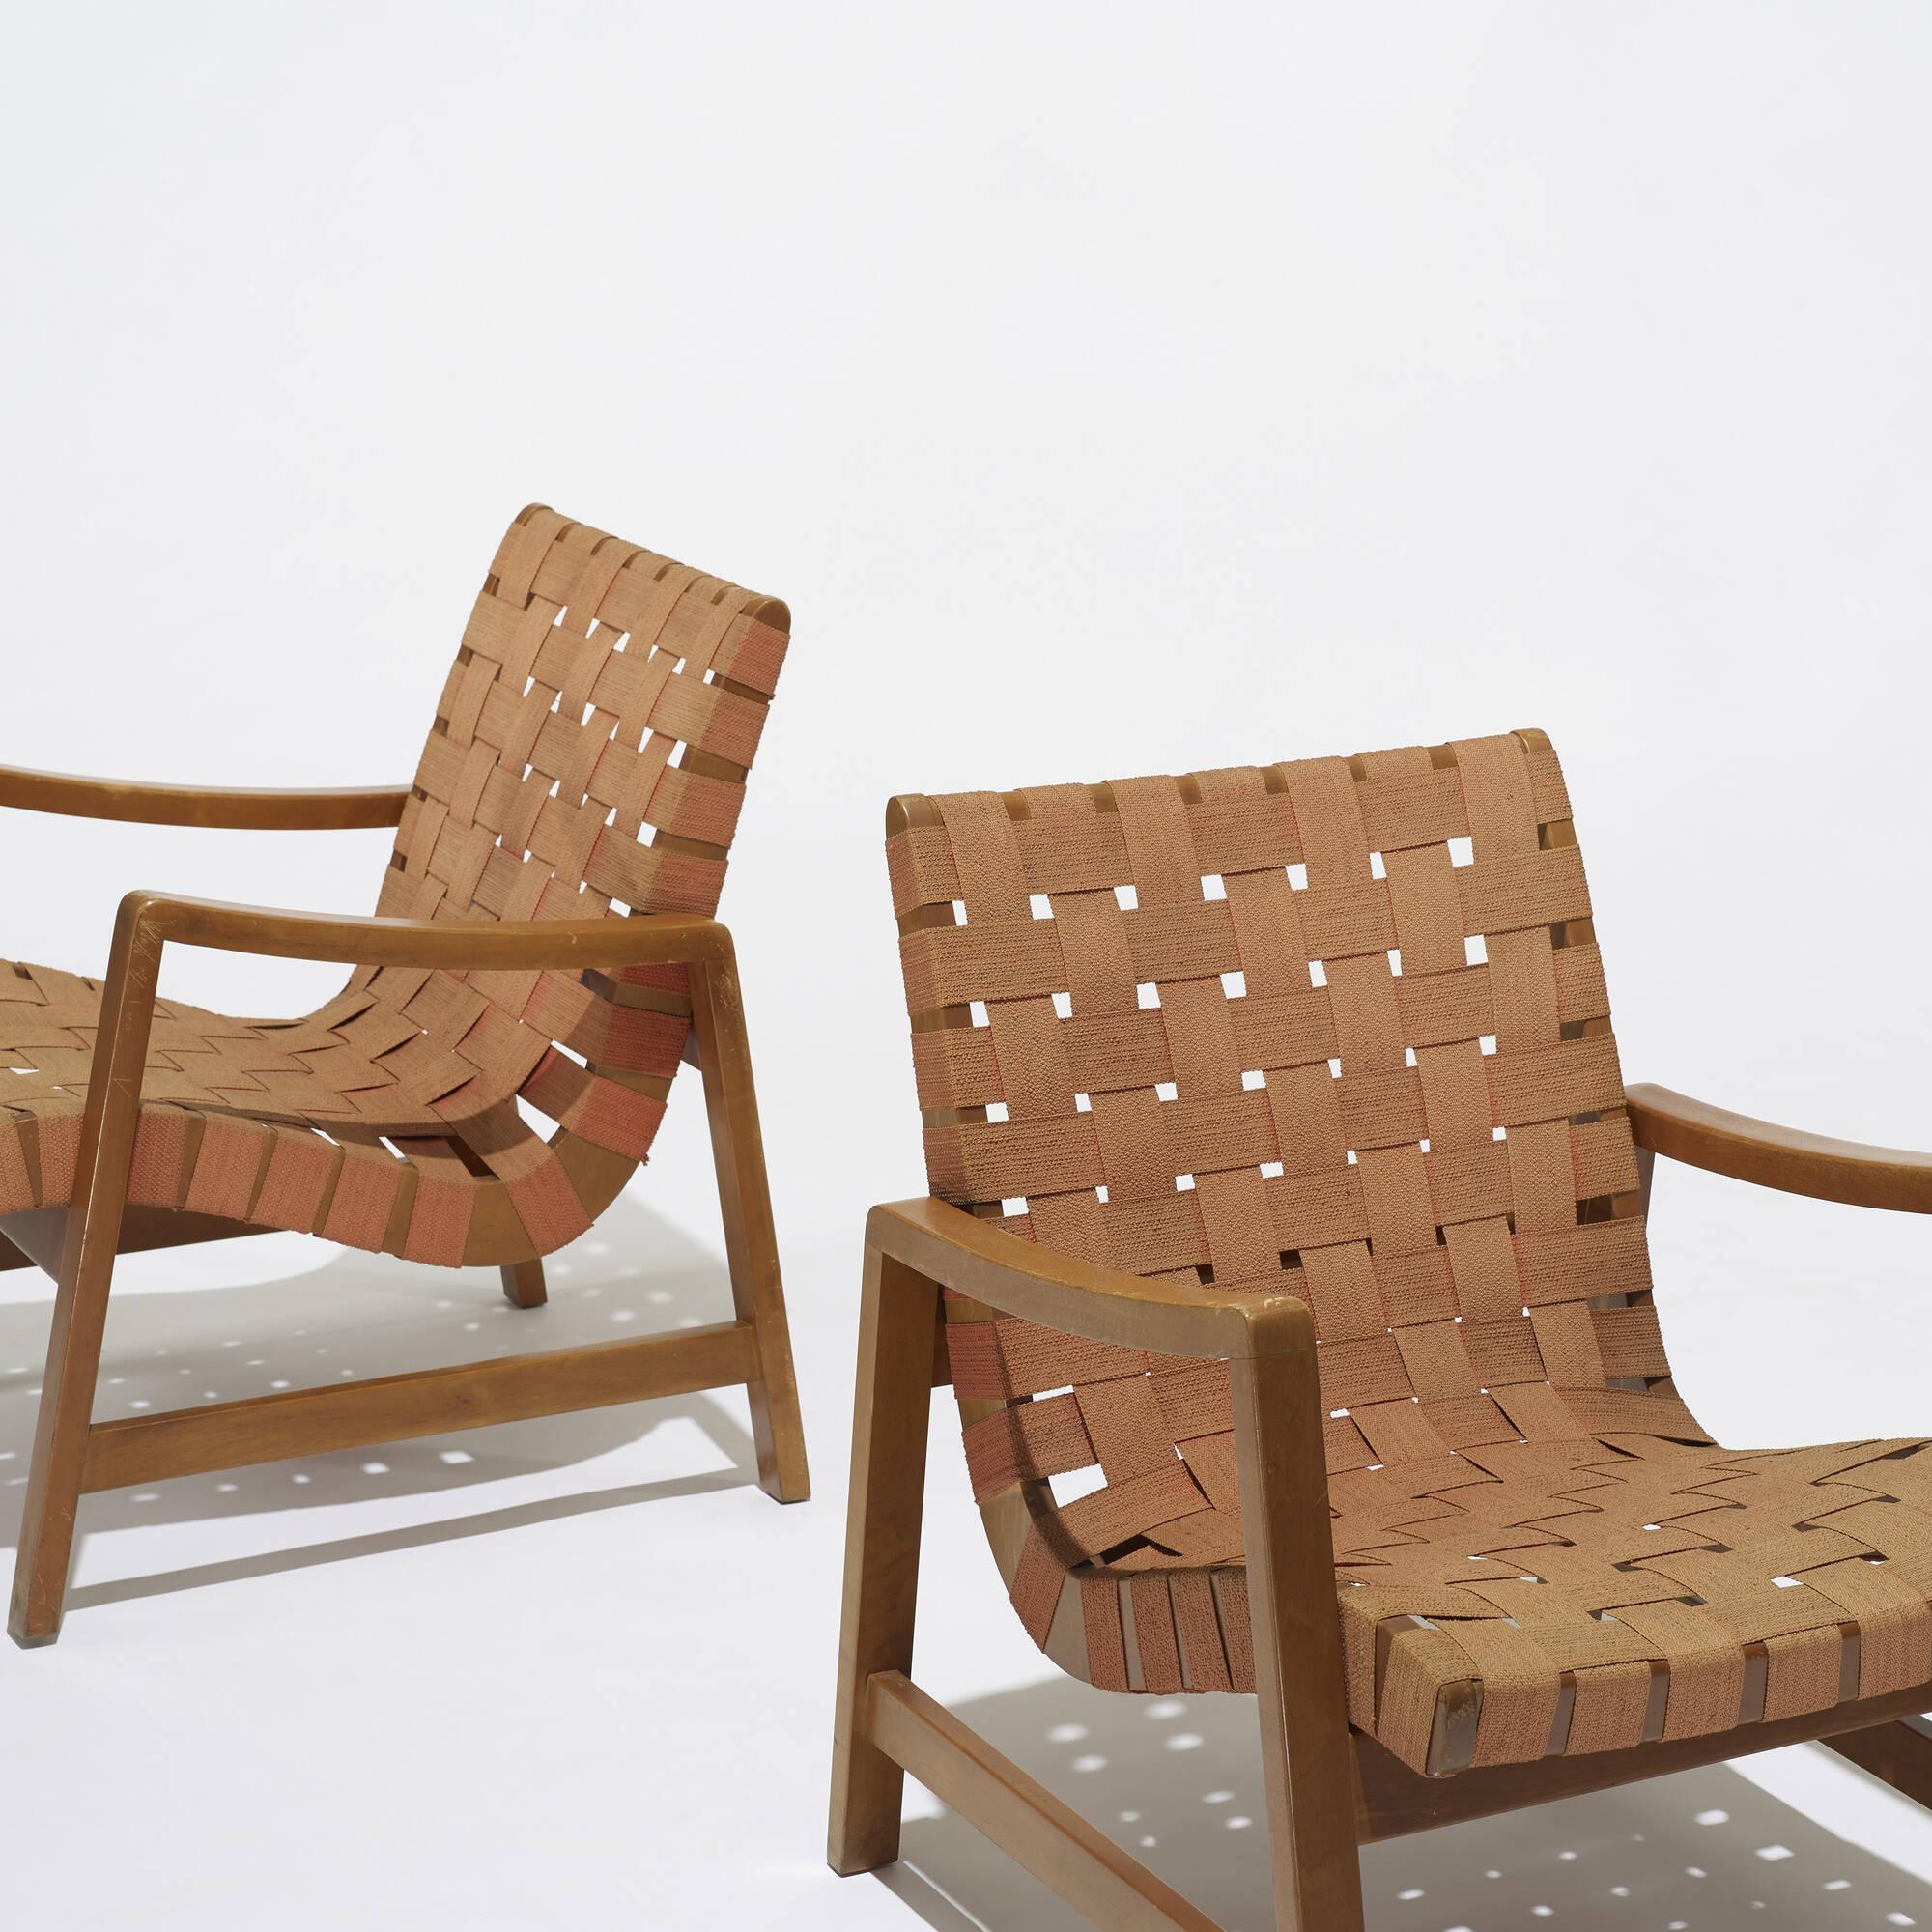 151 jens risom lounge chairs model 652 w pair american